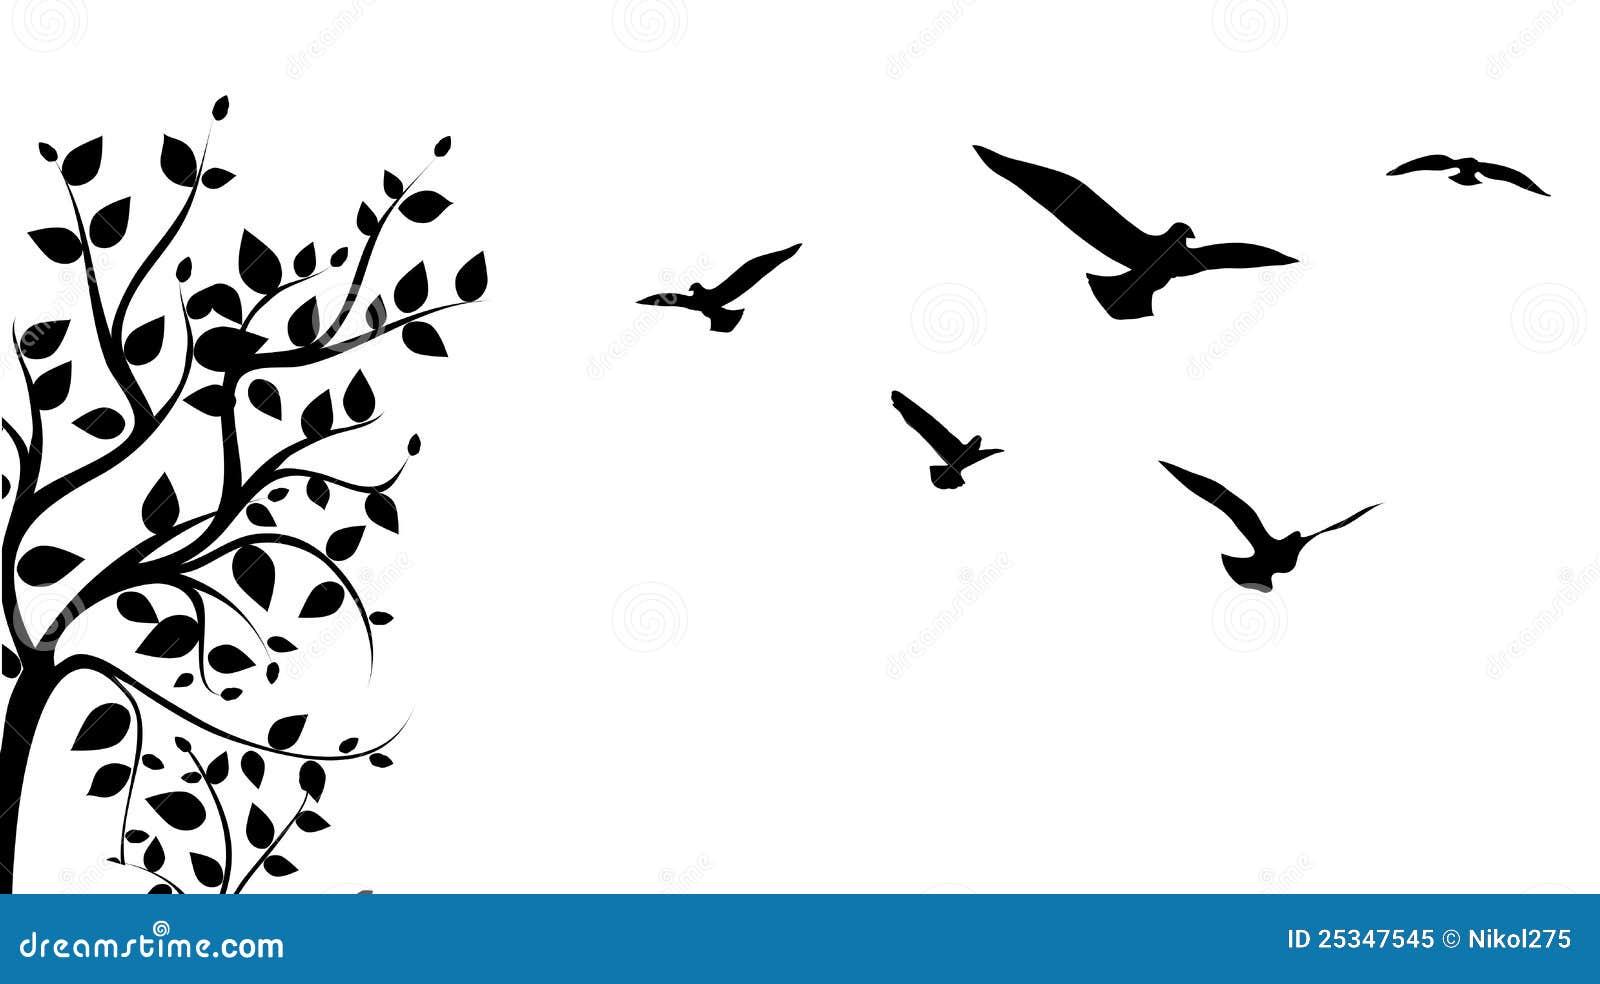 Tree And Bird Royalty Free Stock Photo Image 25347545